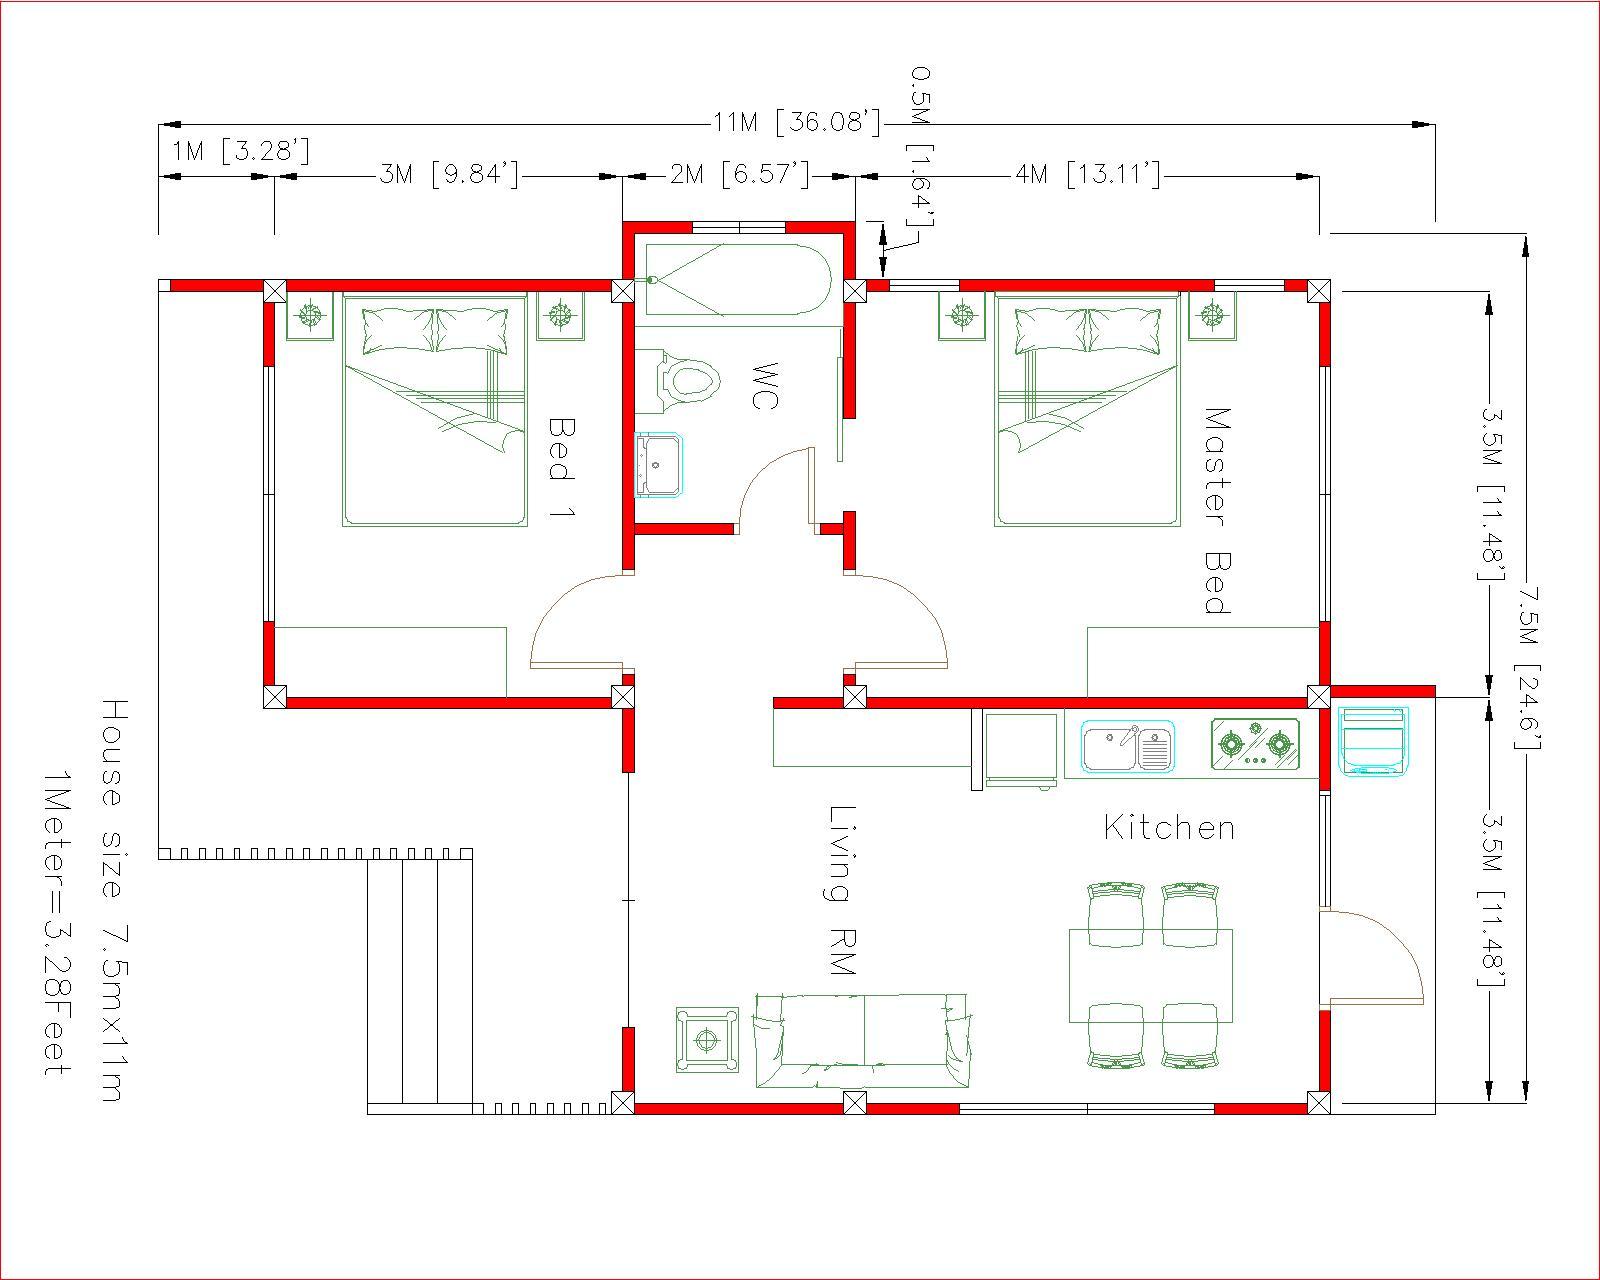 Cute Small Houses 7.5x11 Meter 25x36 Feet 2 beds floor plan